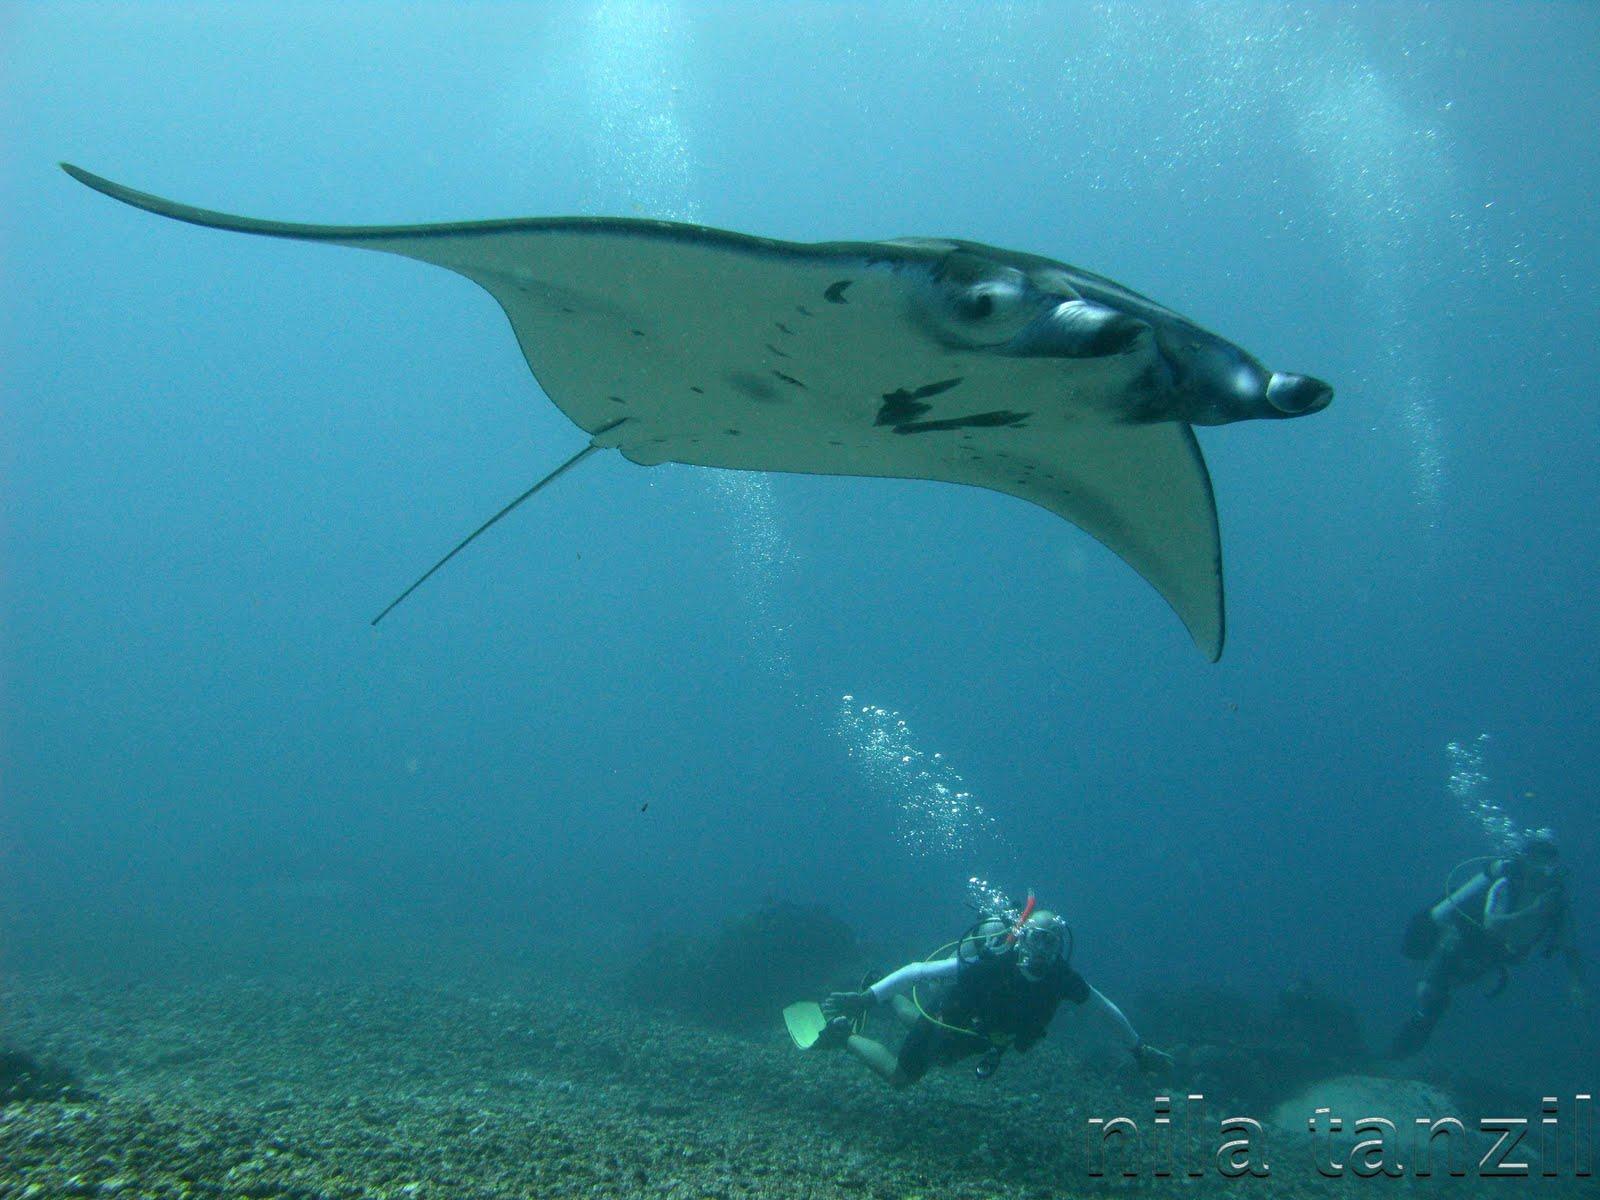 10 Hewan Berbahaya di Laut  Bening Ravampire